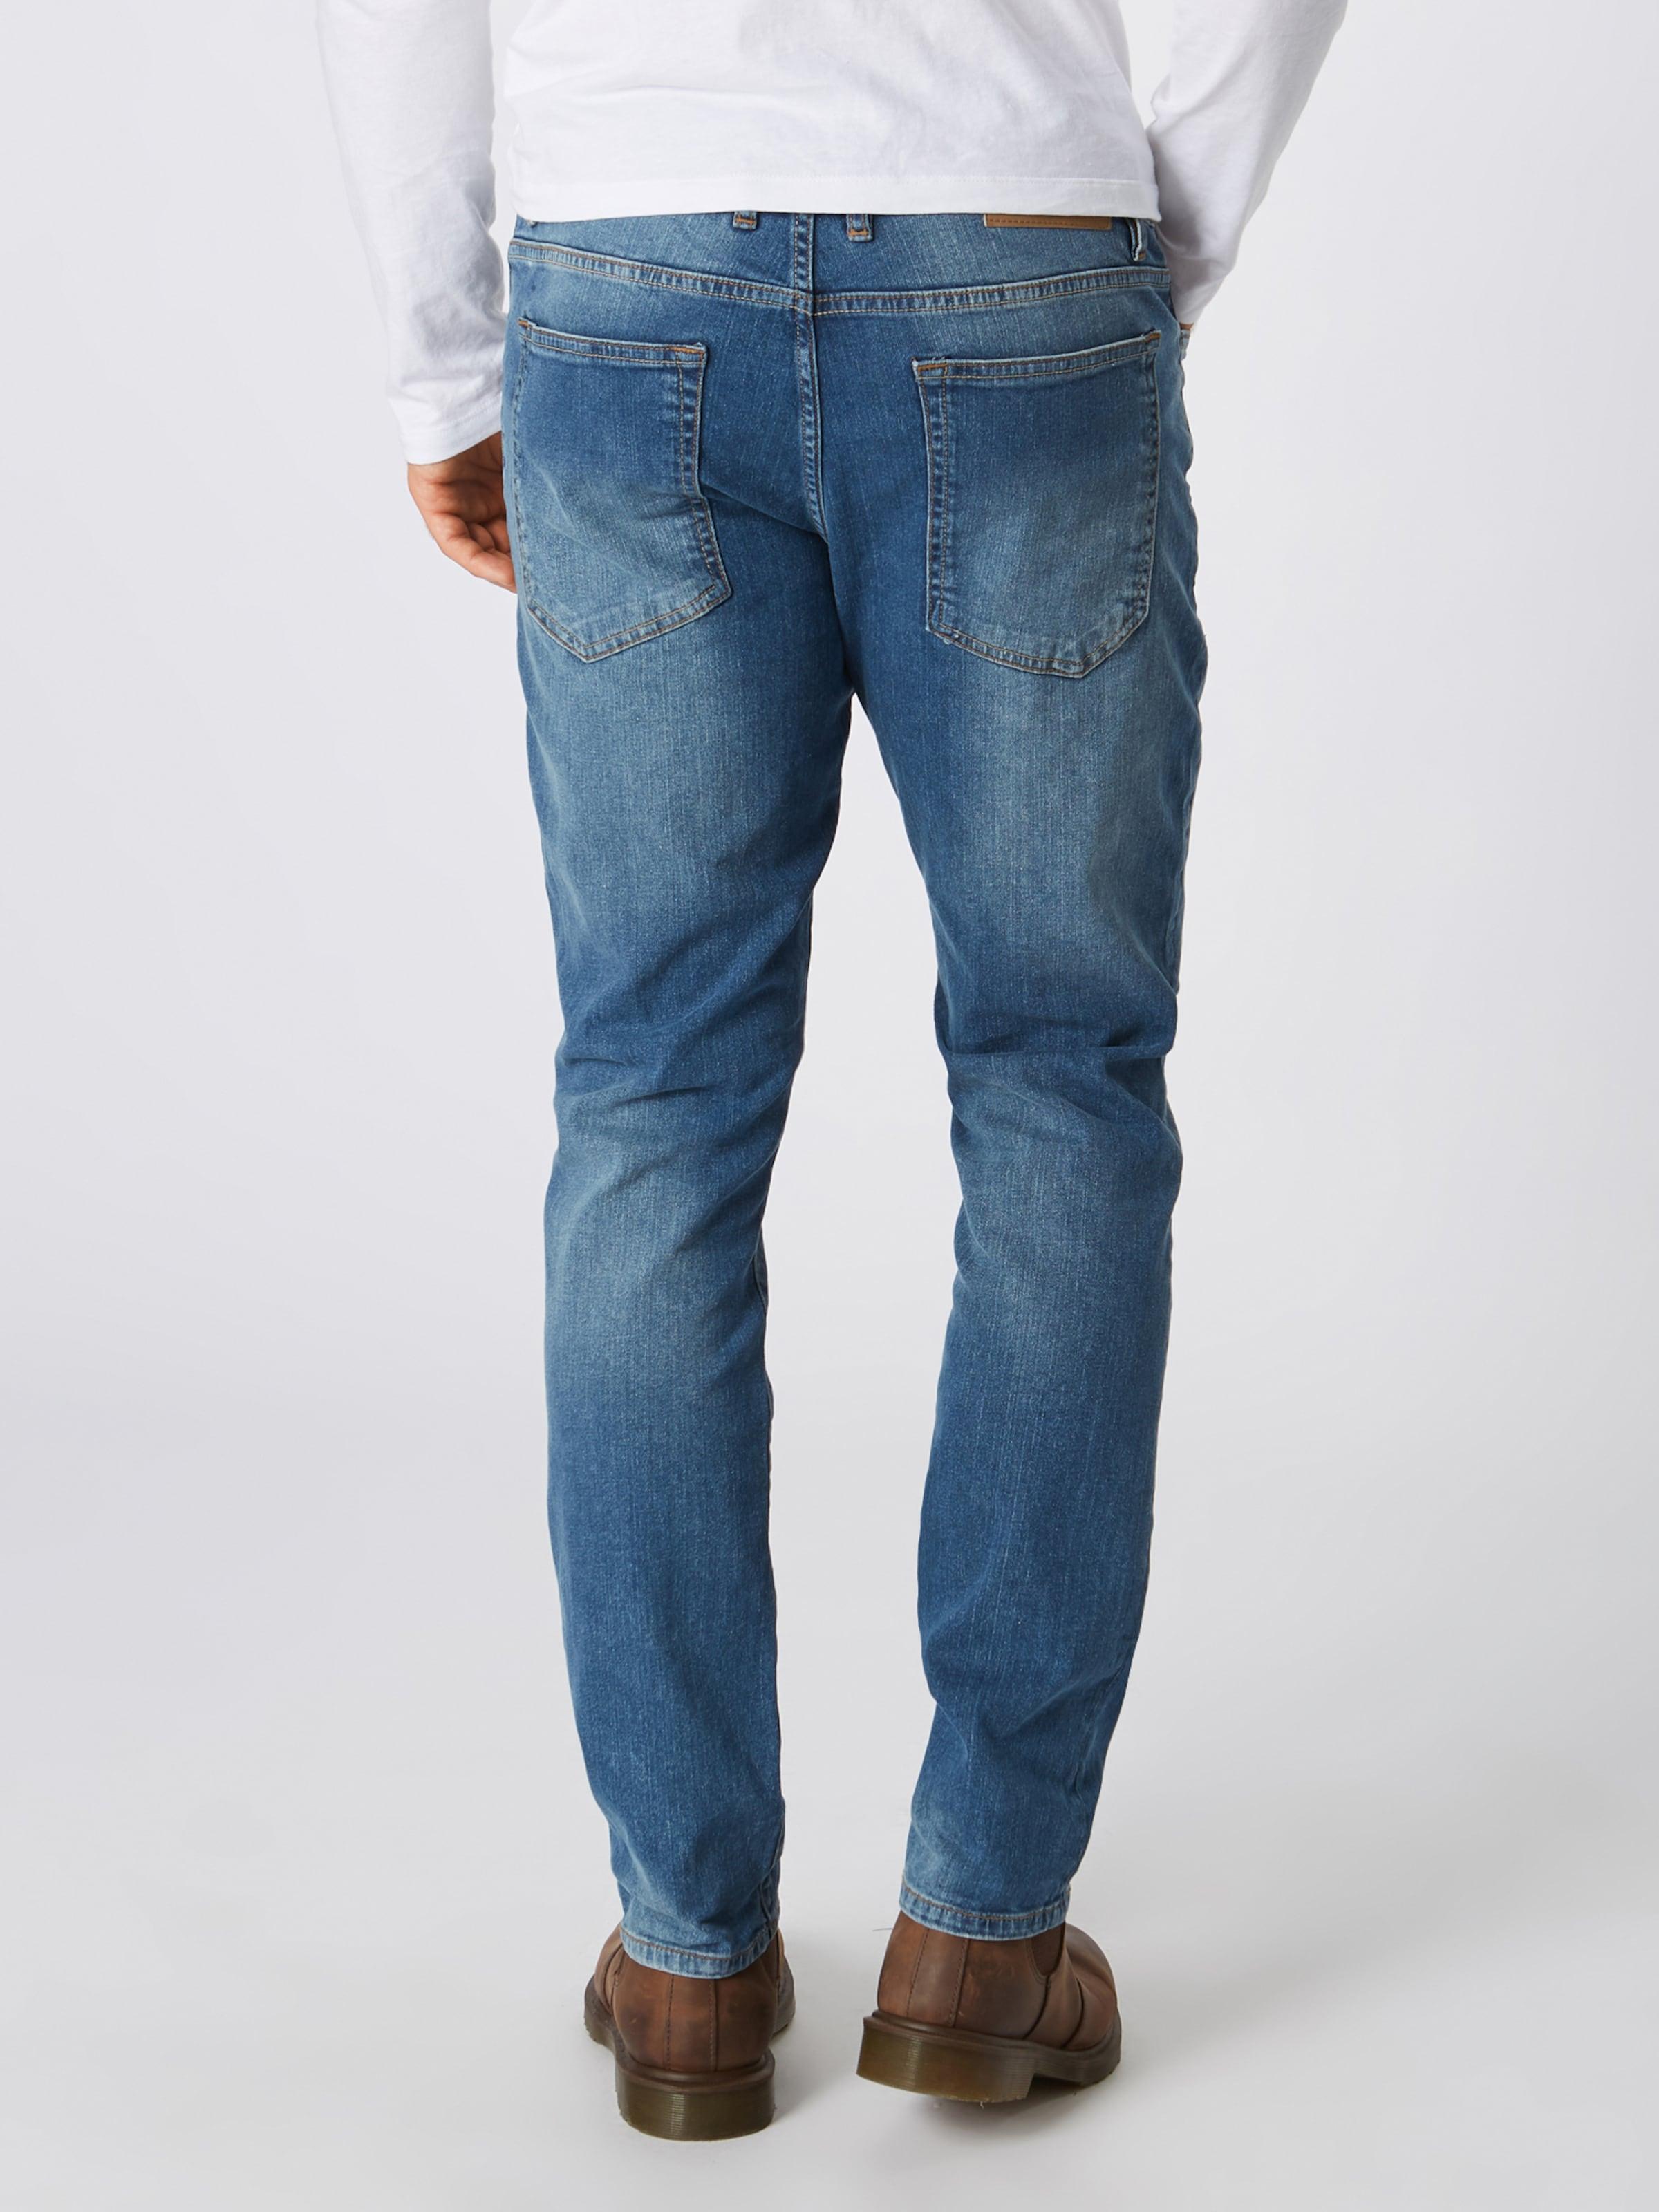 'josh' En Denim Tom Bleu Jean Tailor DHbEY2eW9I